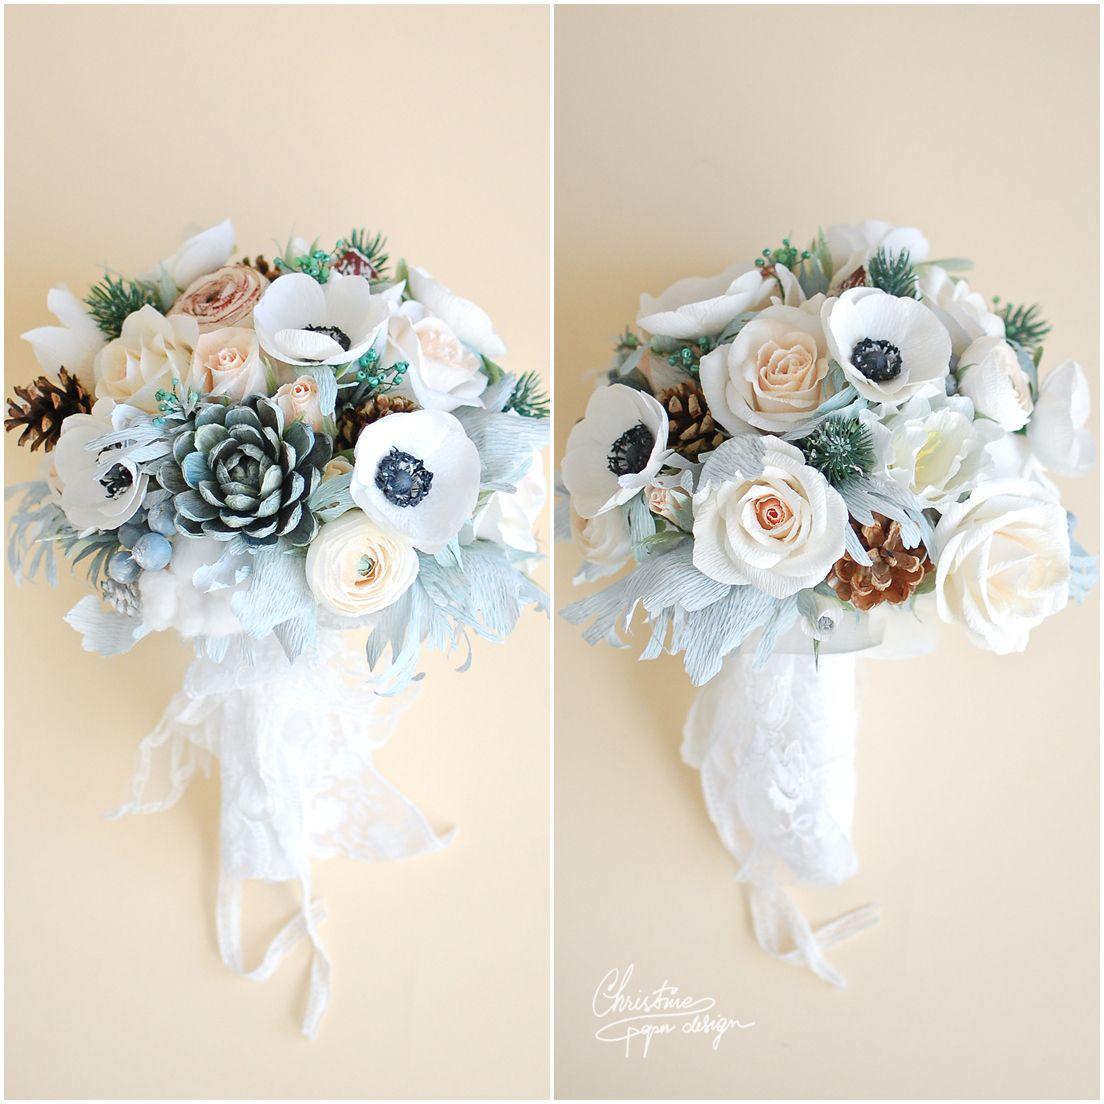 Wedding bouquets not flowers  Christine paper design  alternative wedding bouquet  Paper